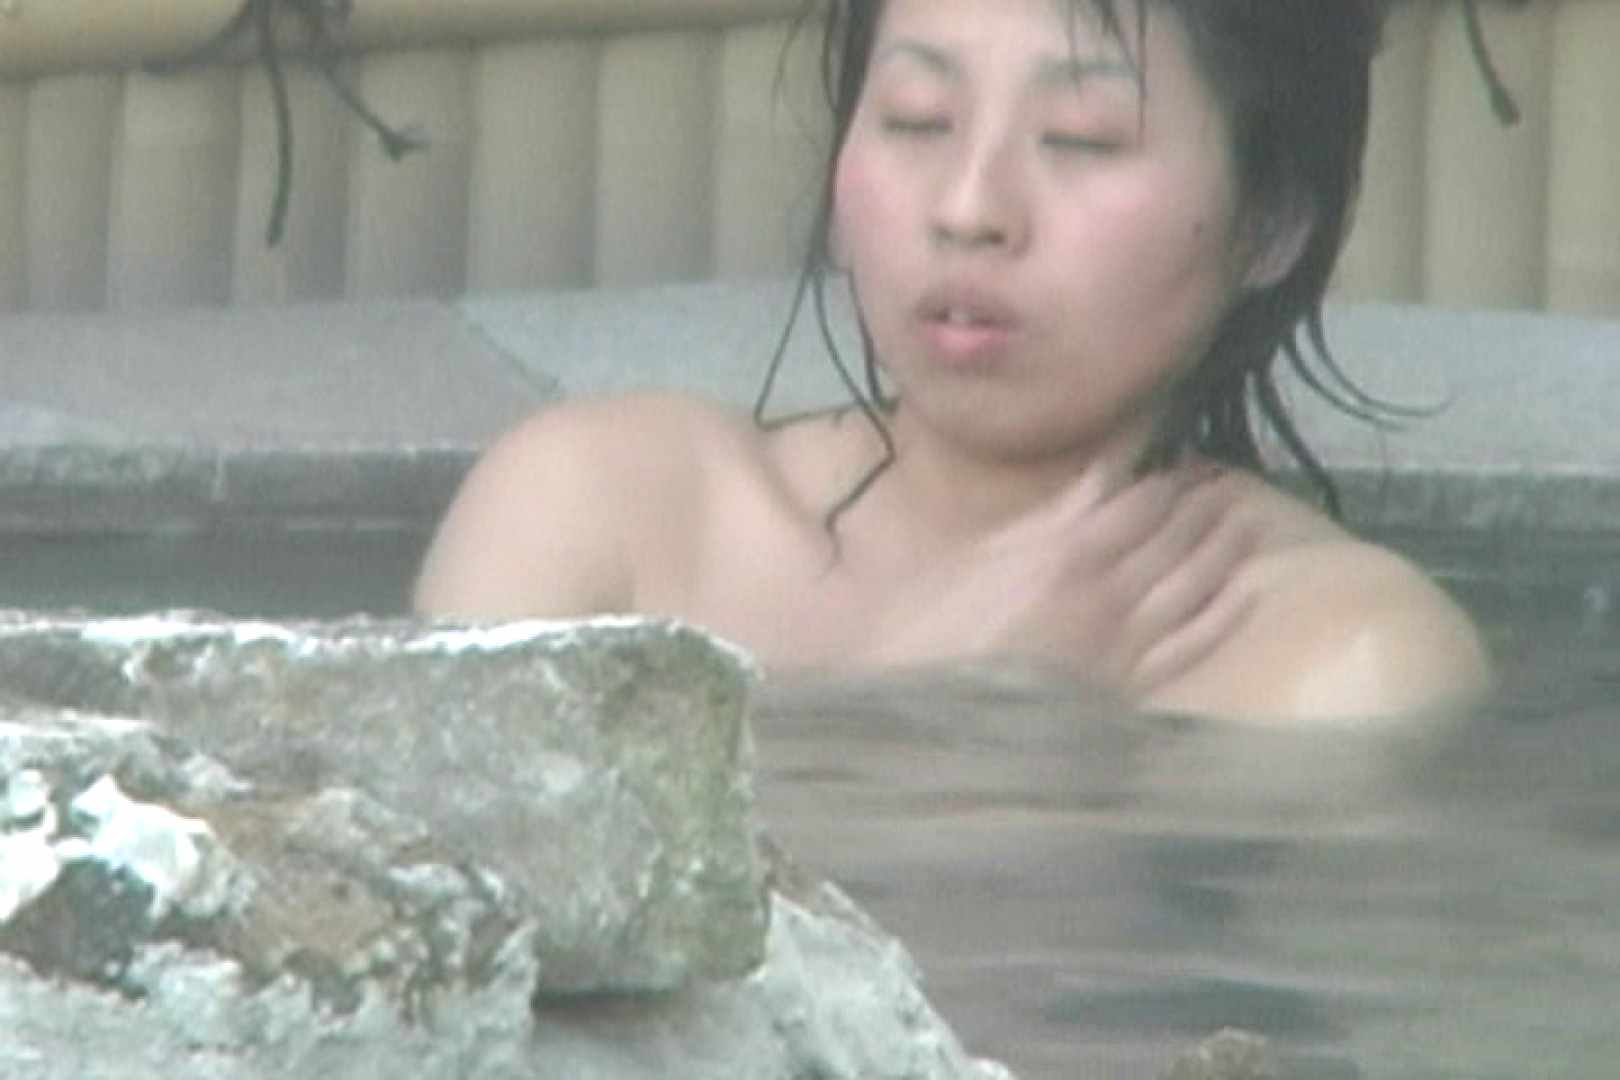 Aquaな露天風呂Vol.589 盗撮 | HなOL  105pic 33